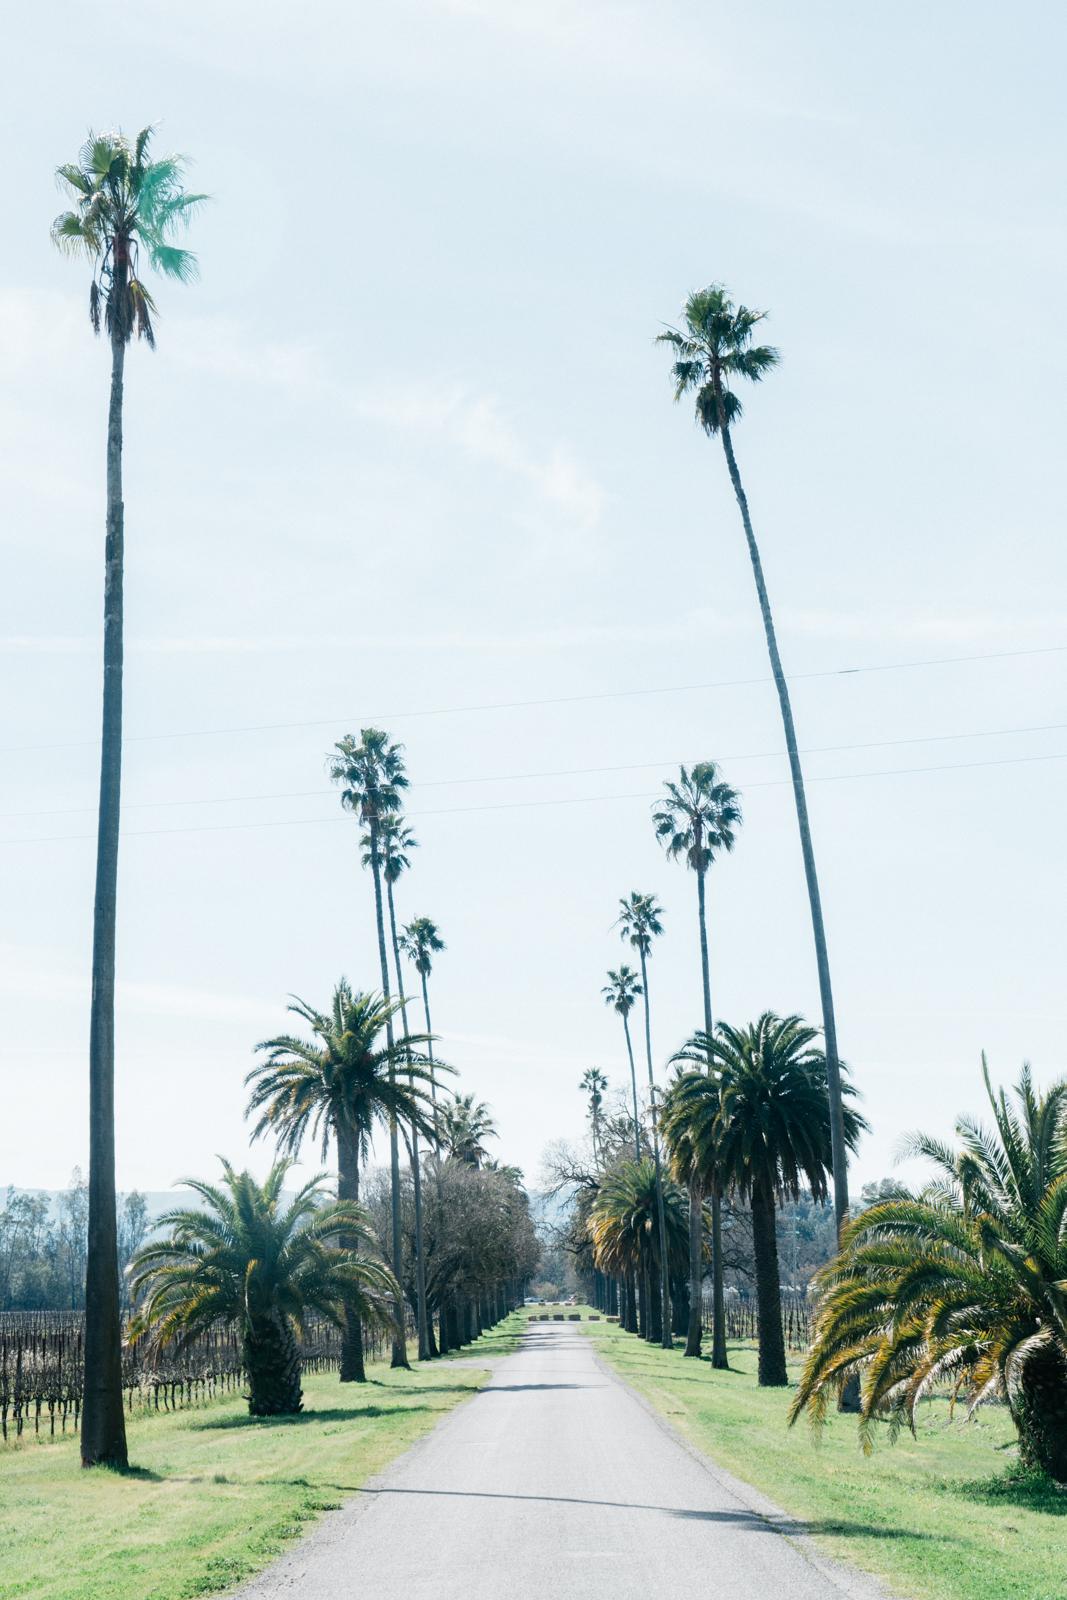 california travel guide